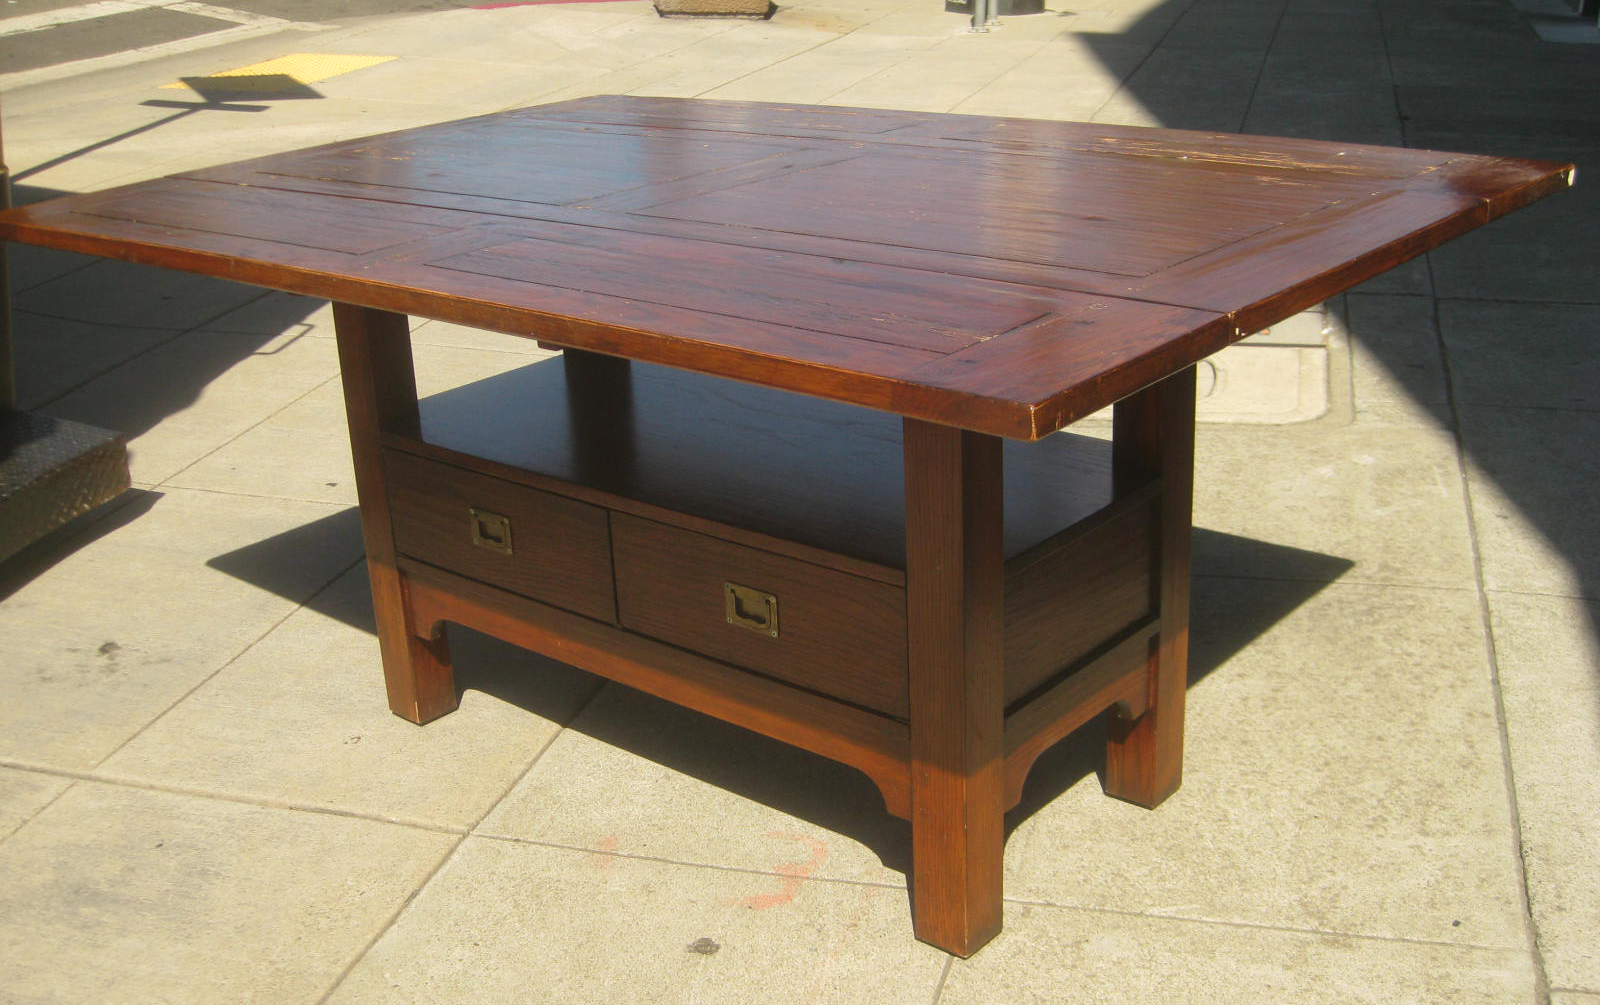 uhuru furniture collectibles sold country kitchen drop leaf table 225. Black Bedroom Furniture Sets. Home Design Ideas